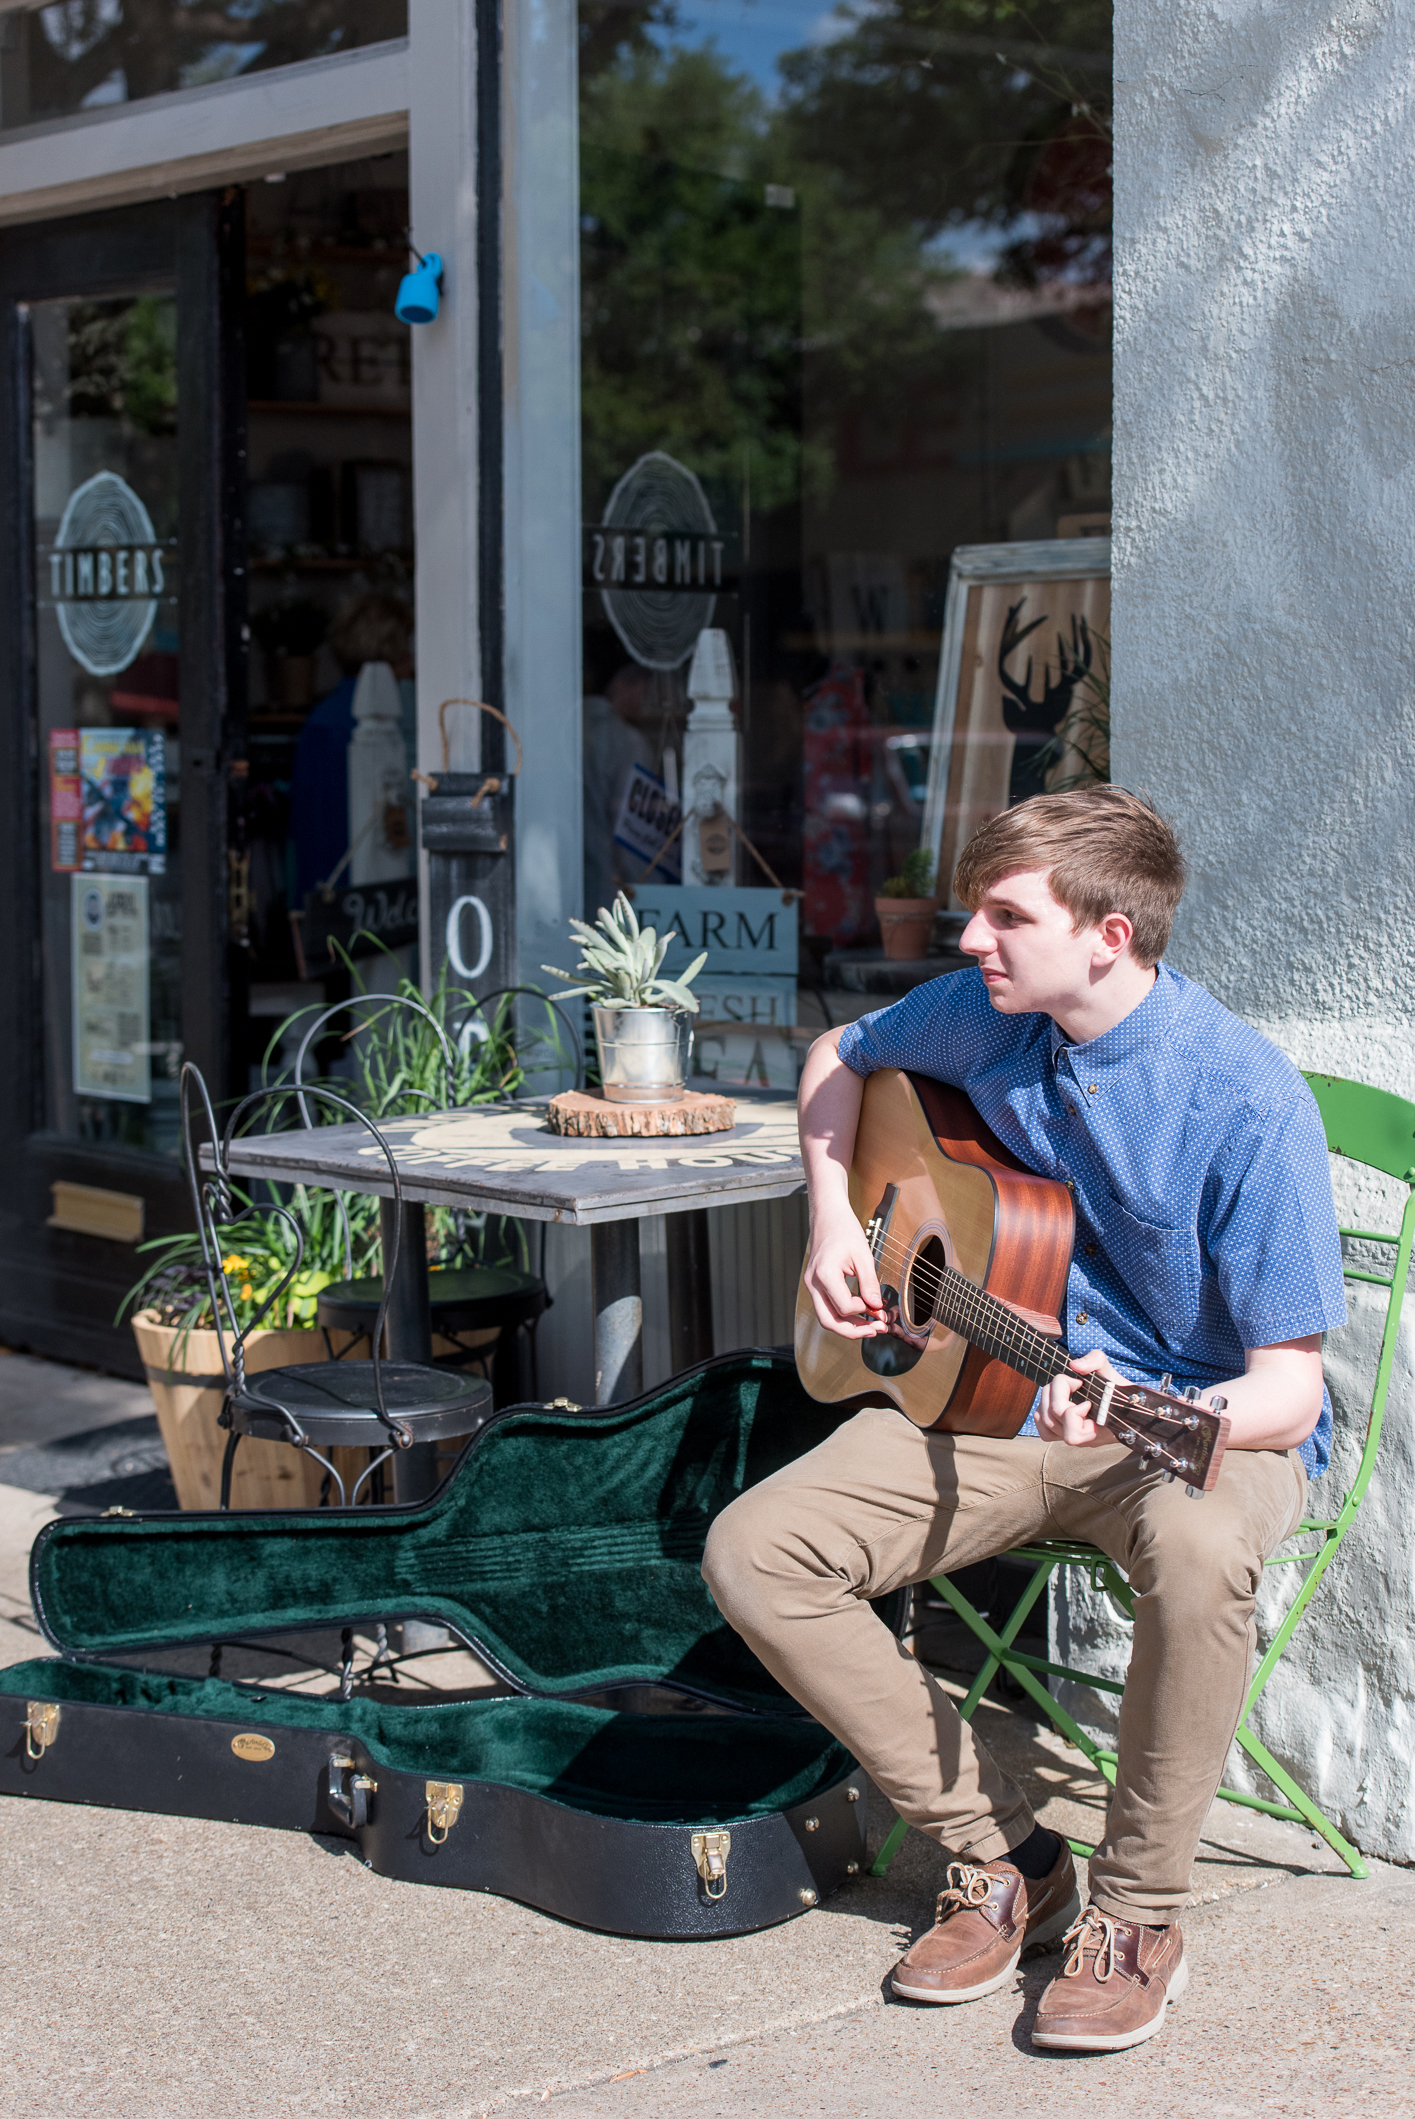 Corsicana-183 - Musician Ben (Buffalo Kid) at Timbers